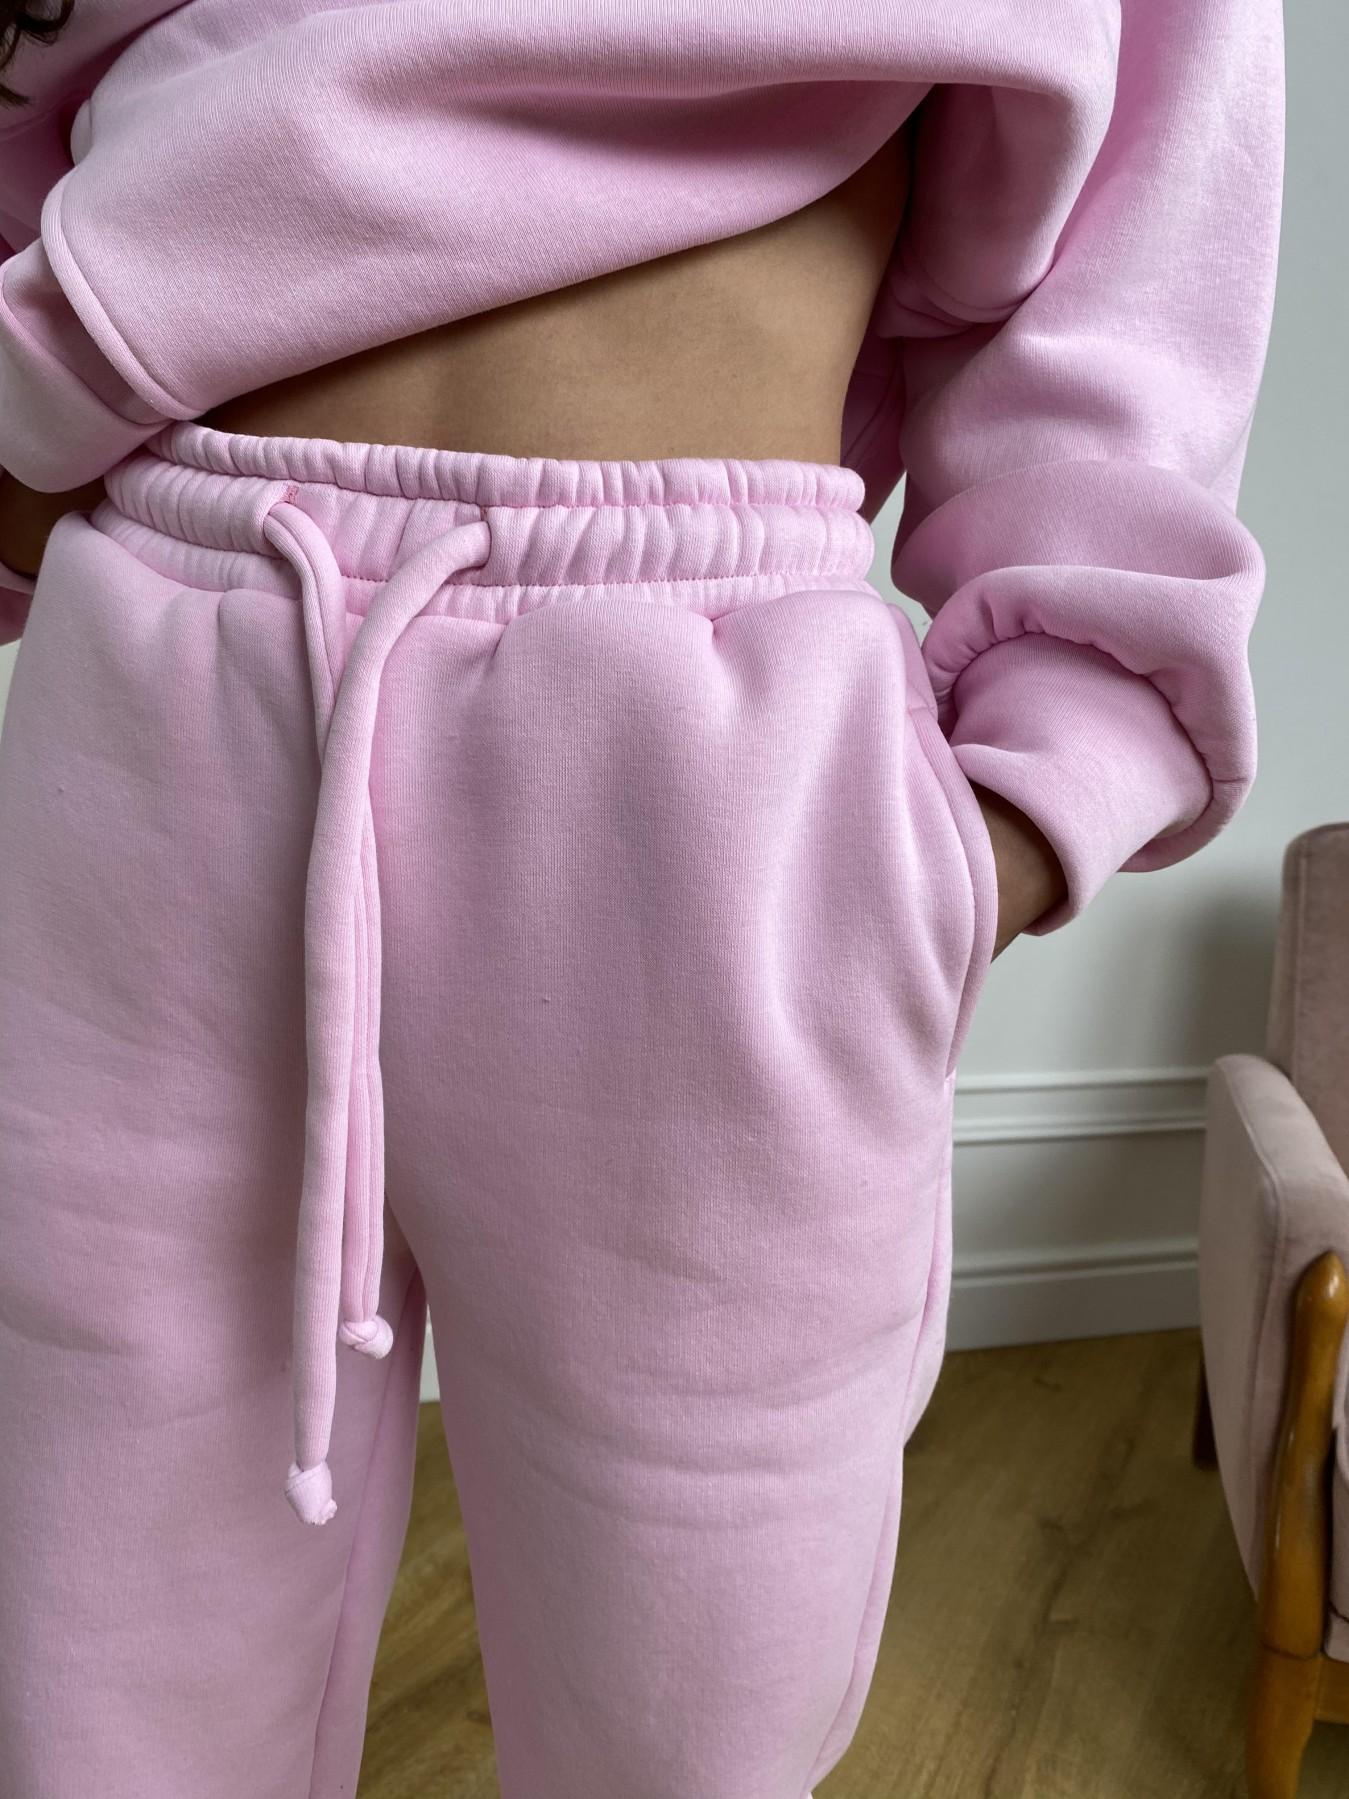 Марион костюм в  стиле Oversize  3х нитка 9651 АРТ. 46922 Цвет: Розовый - фото 10, интернет магазин tm-modus.ru